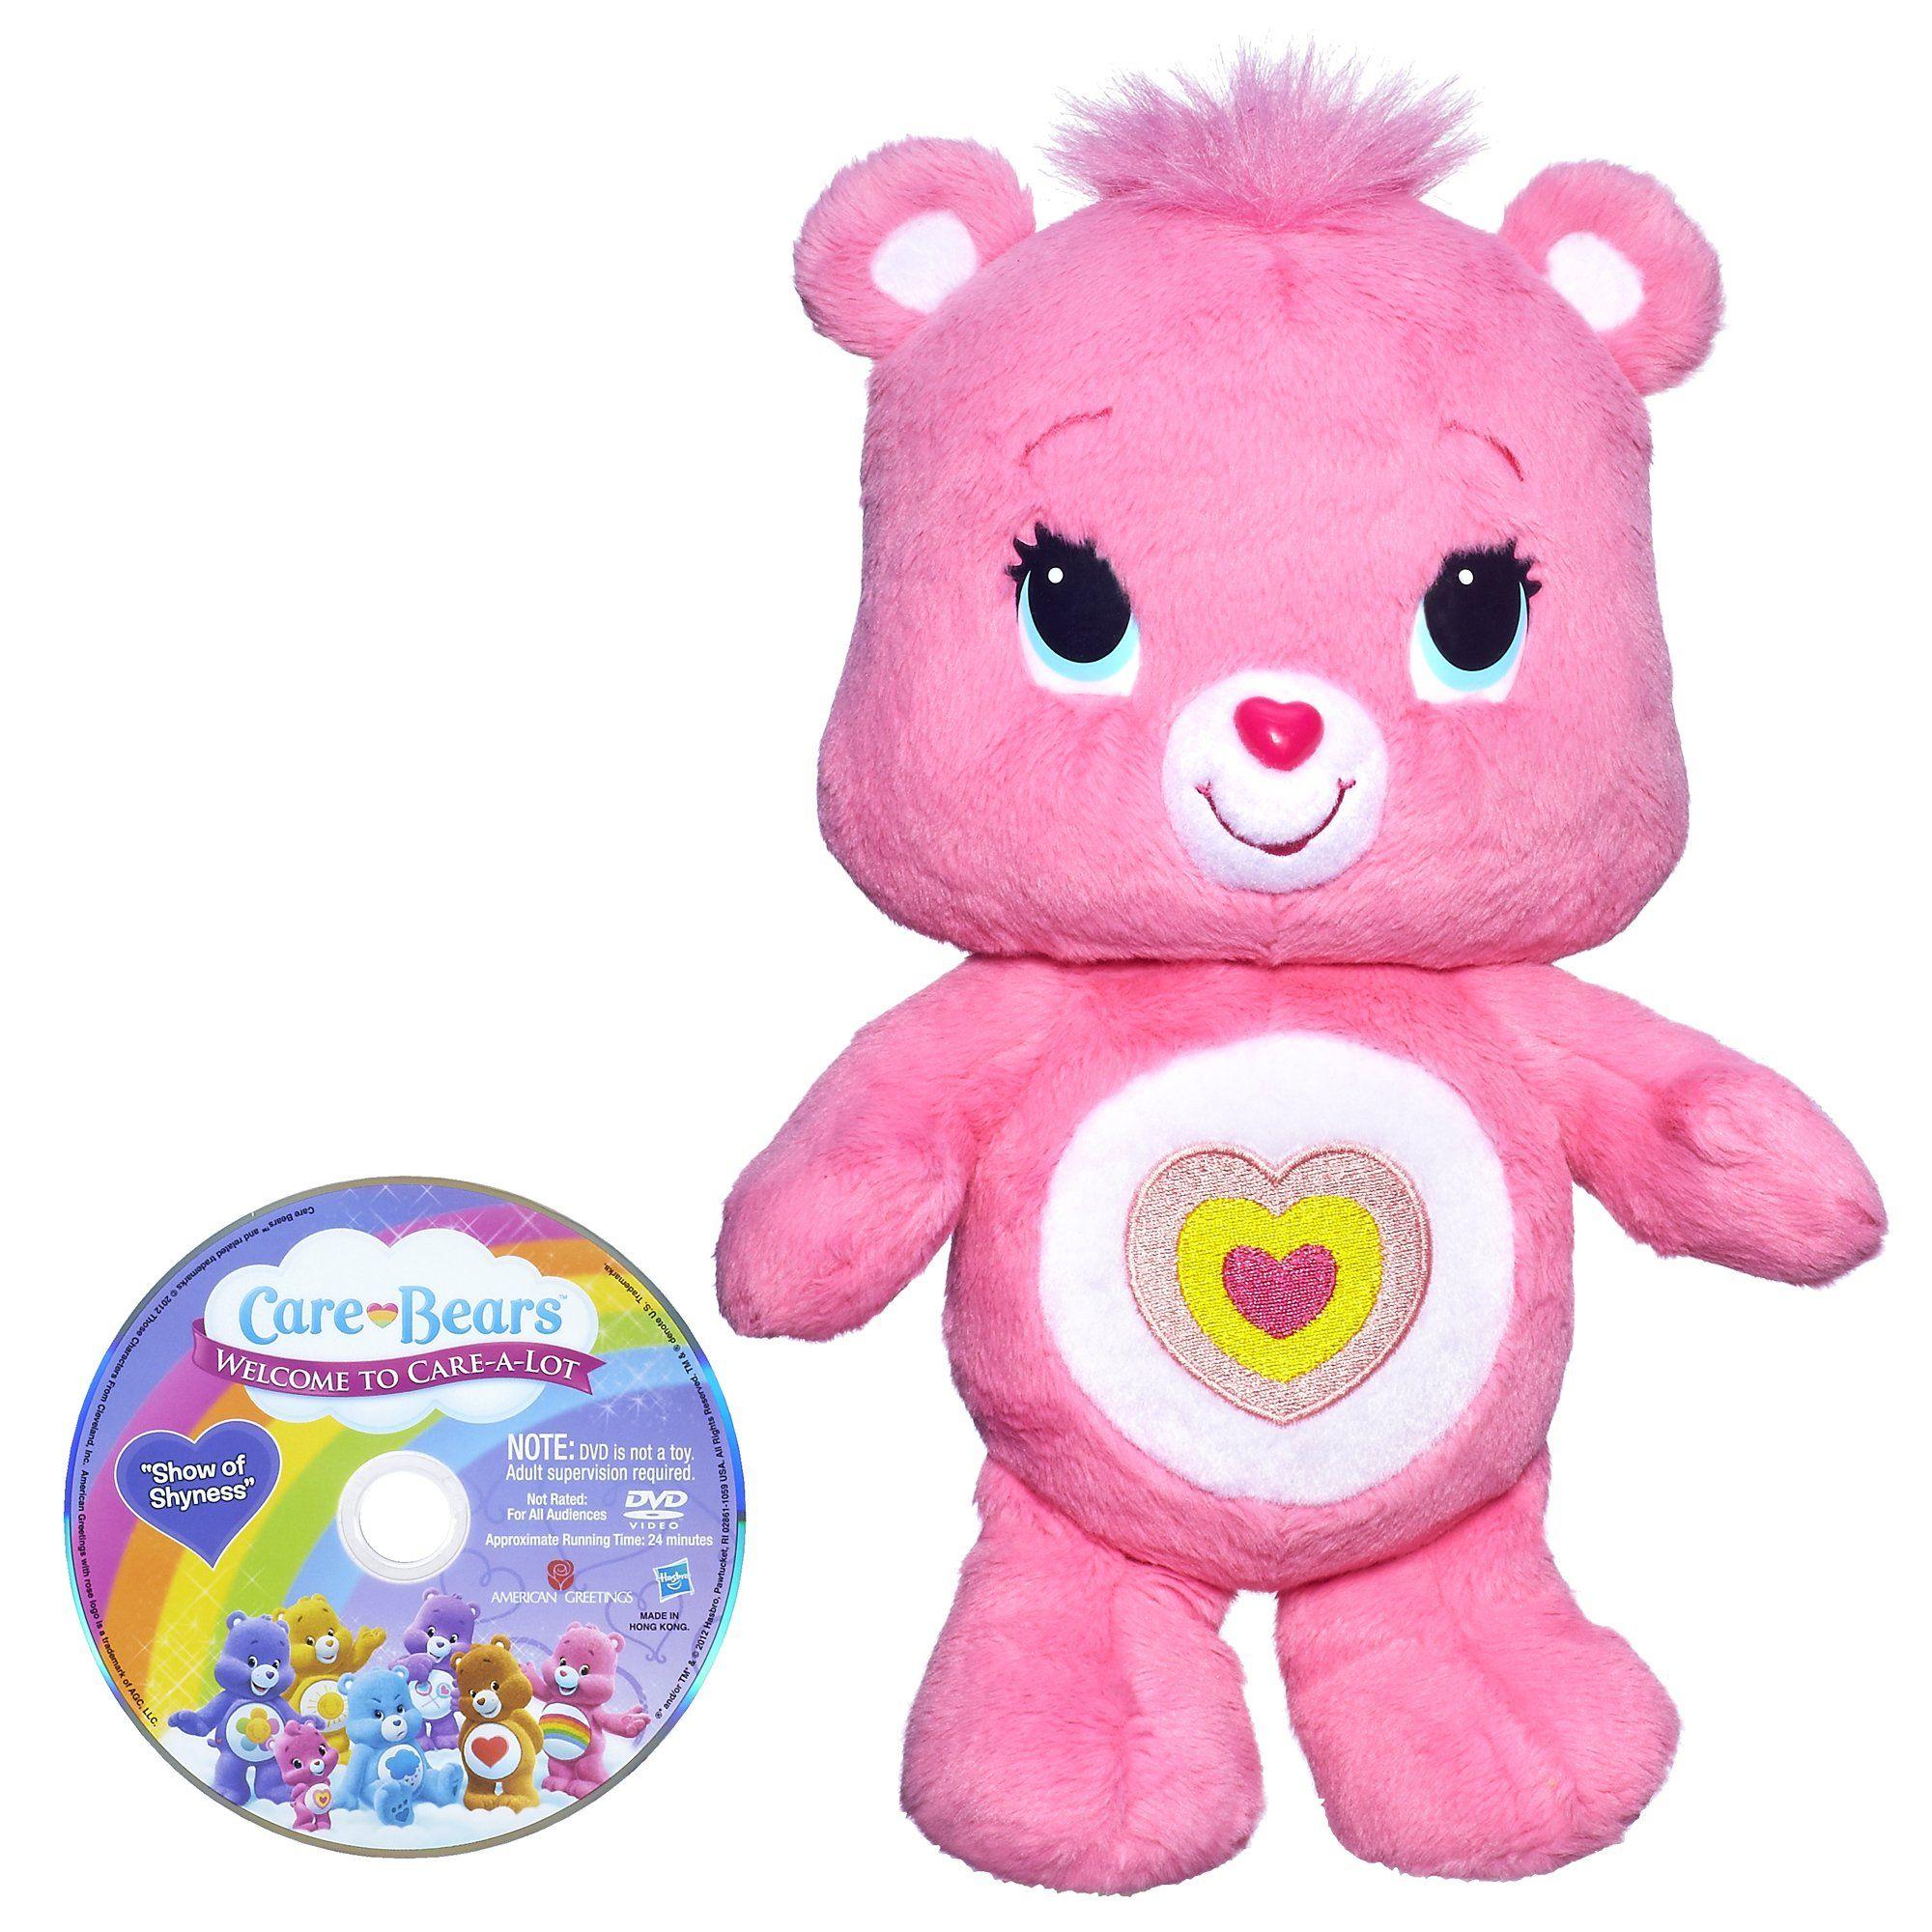 Message Recorder Stuffed Animals, Care Bears Wonderheart Bear Toy Care Bears Plush Teddy Bear Stuffed Animal Bear Toy